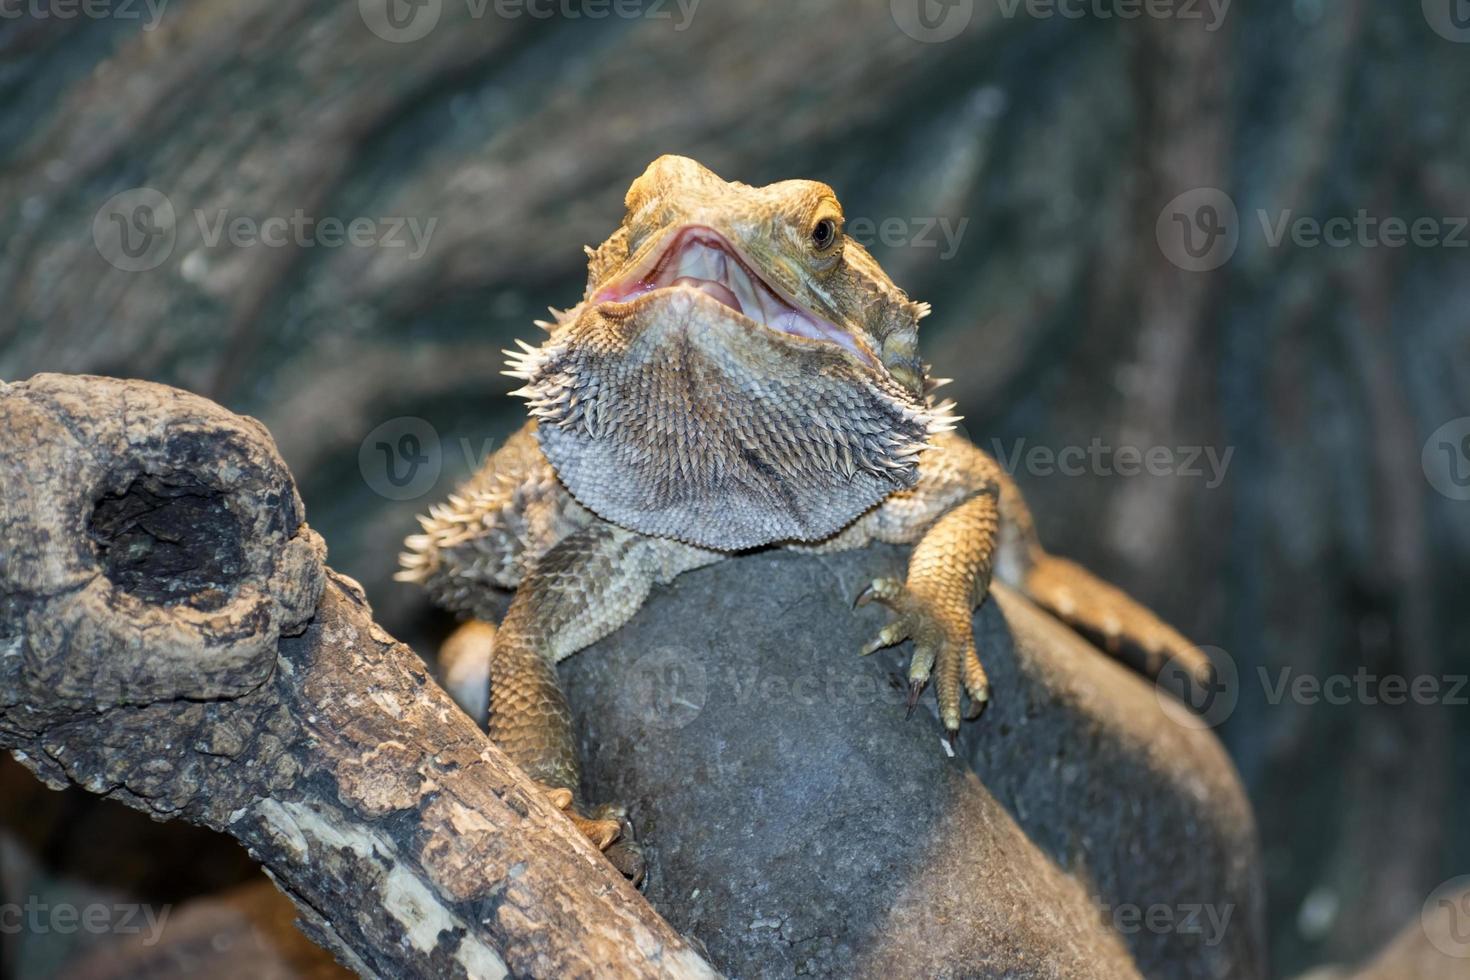 dragones barbudos del interior (pogona vitticeps) foto